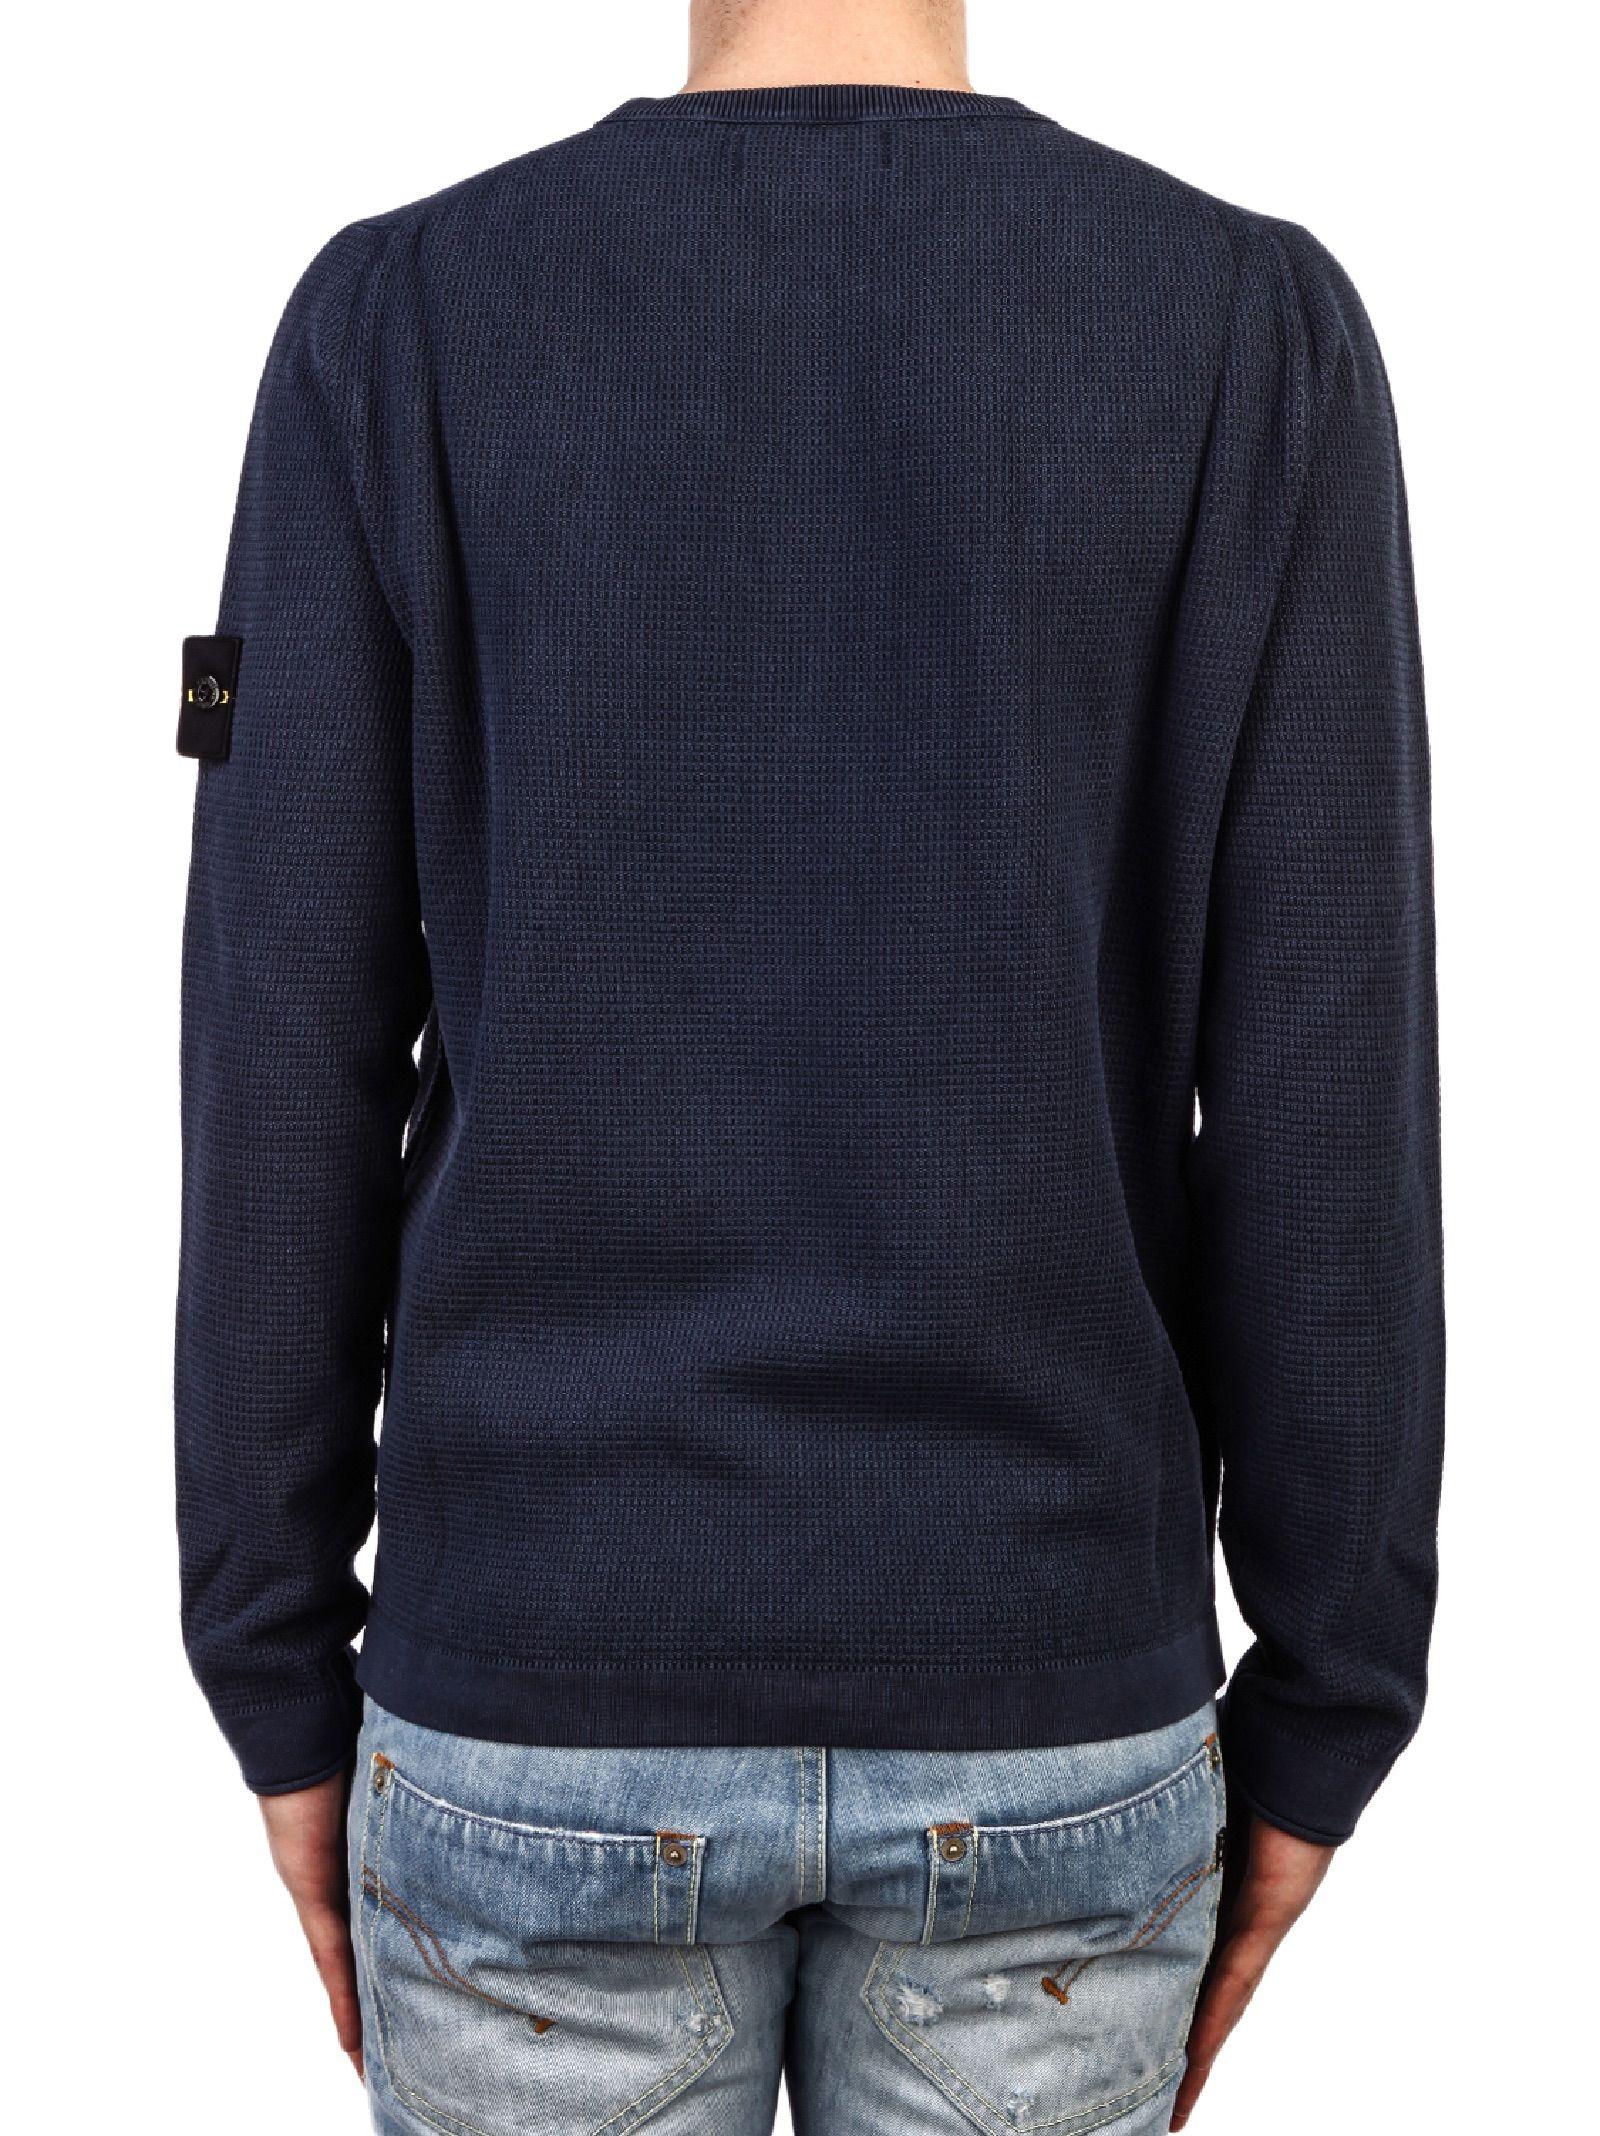 stone island stone island t co frost sweater blue men 39 s sweaters italist. Black Bedroom Furniture Sets. Home Design Ideas